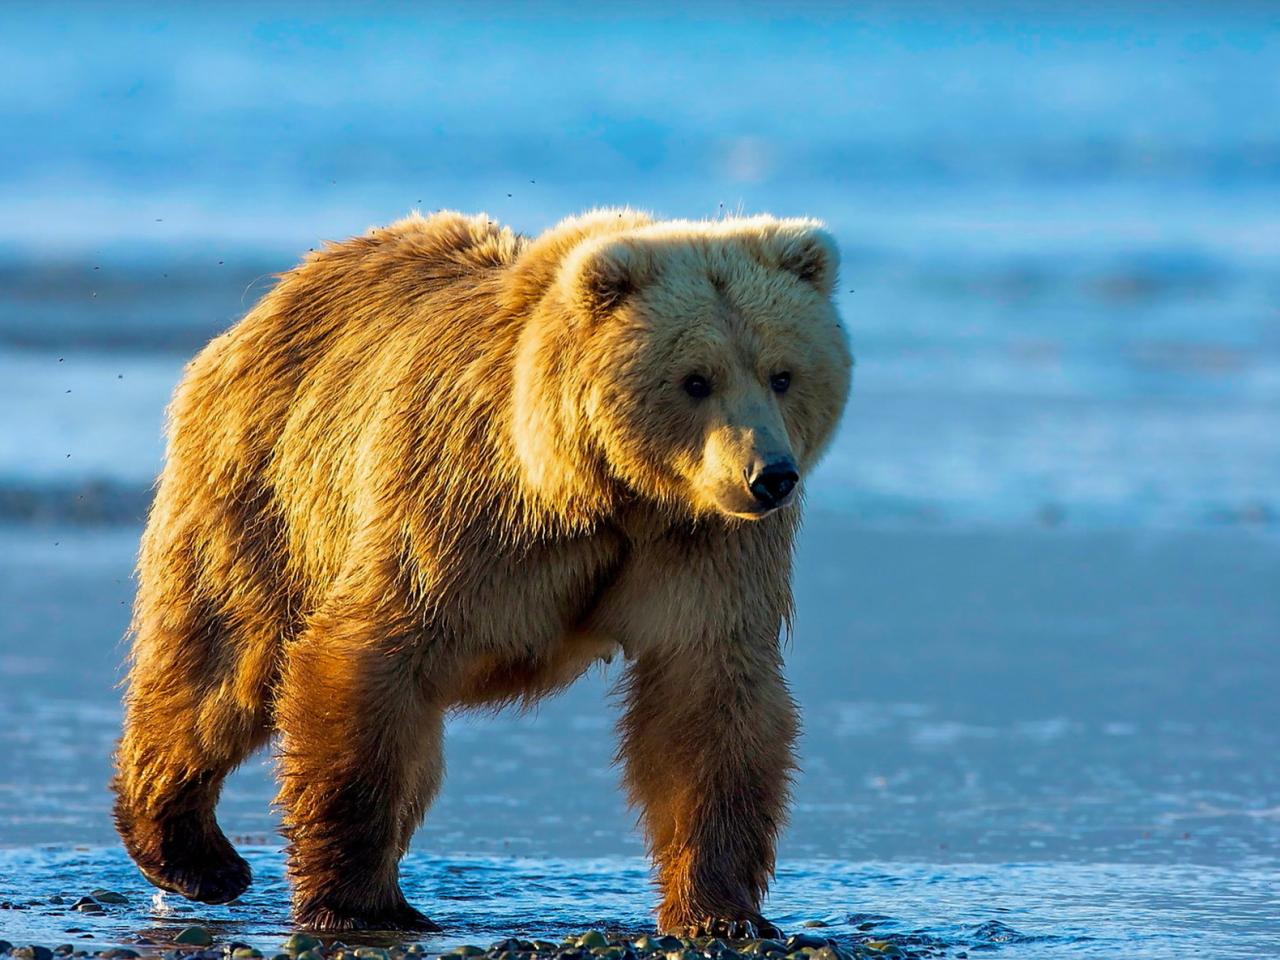 1280x960 wallpaper Bear, wild animal, furry animal